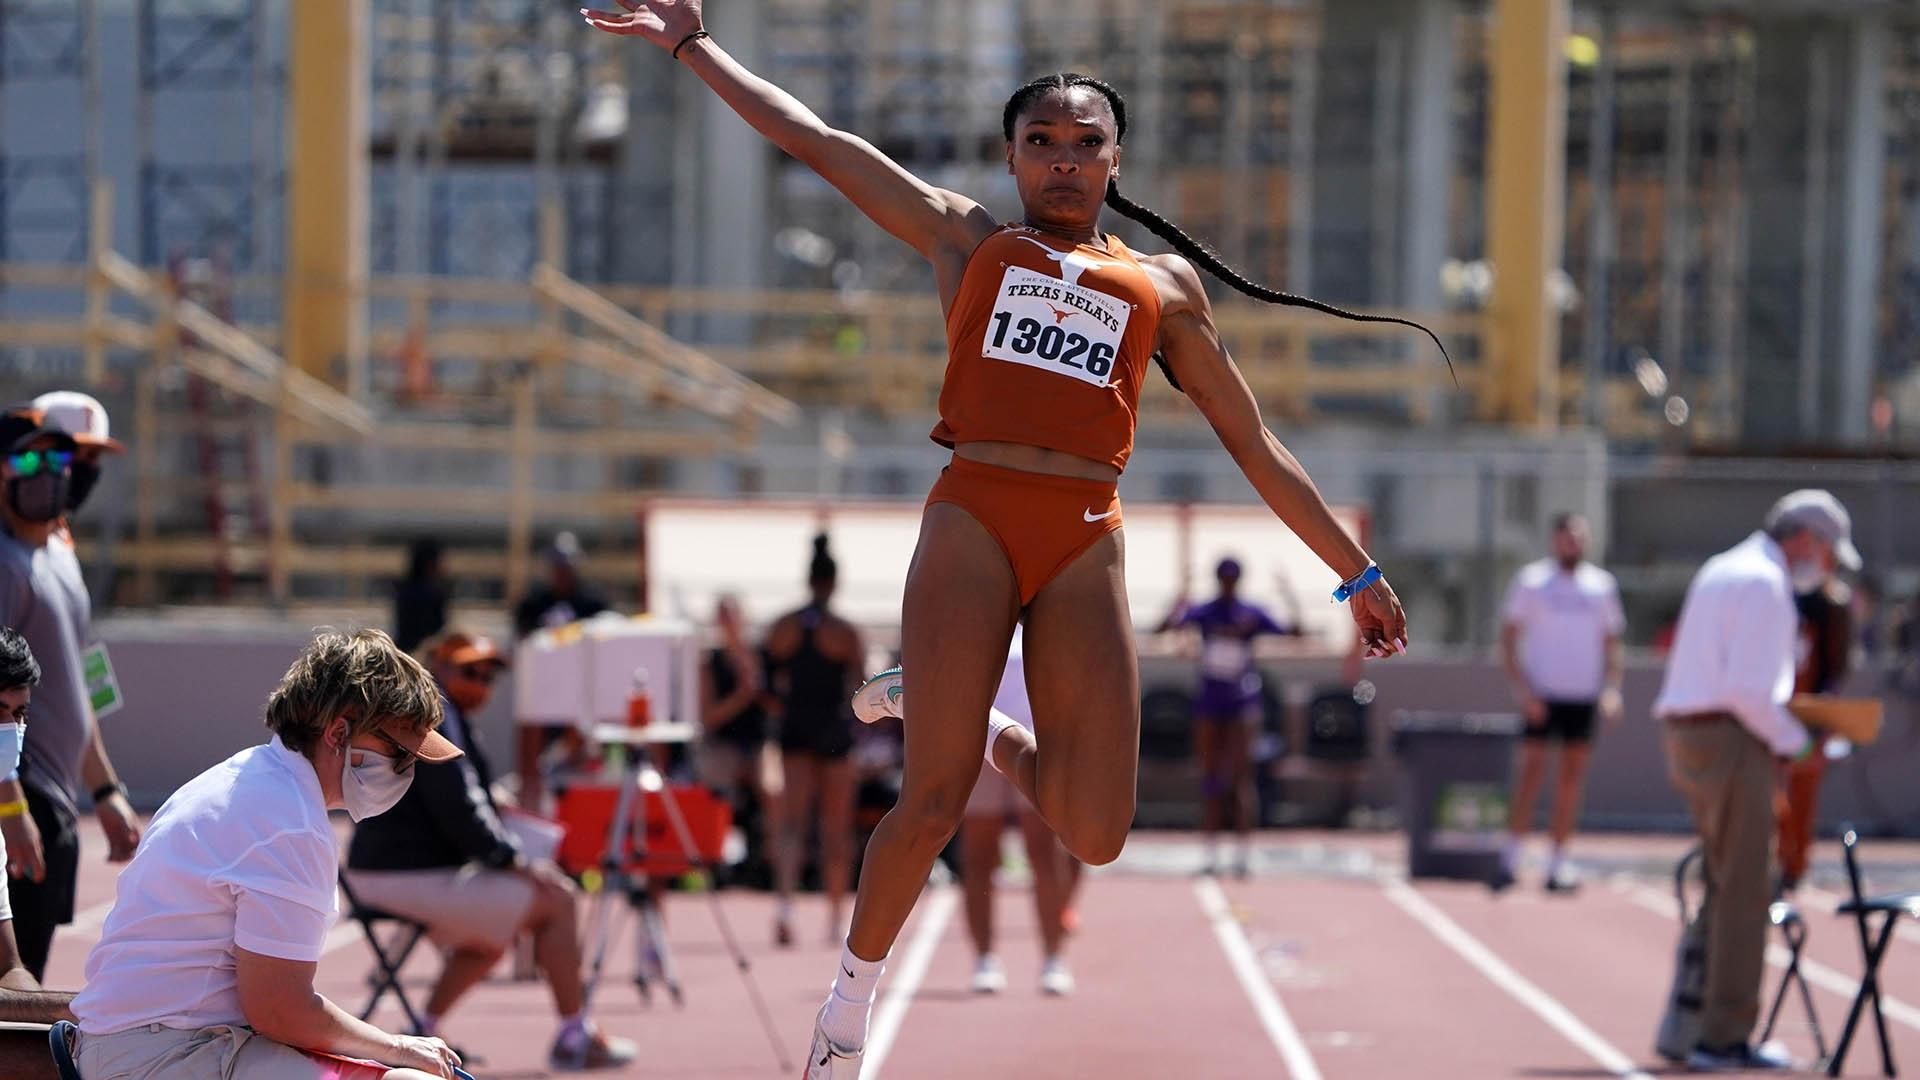 Tara Davis competes in the long jump at 2021 Texas Relays